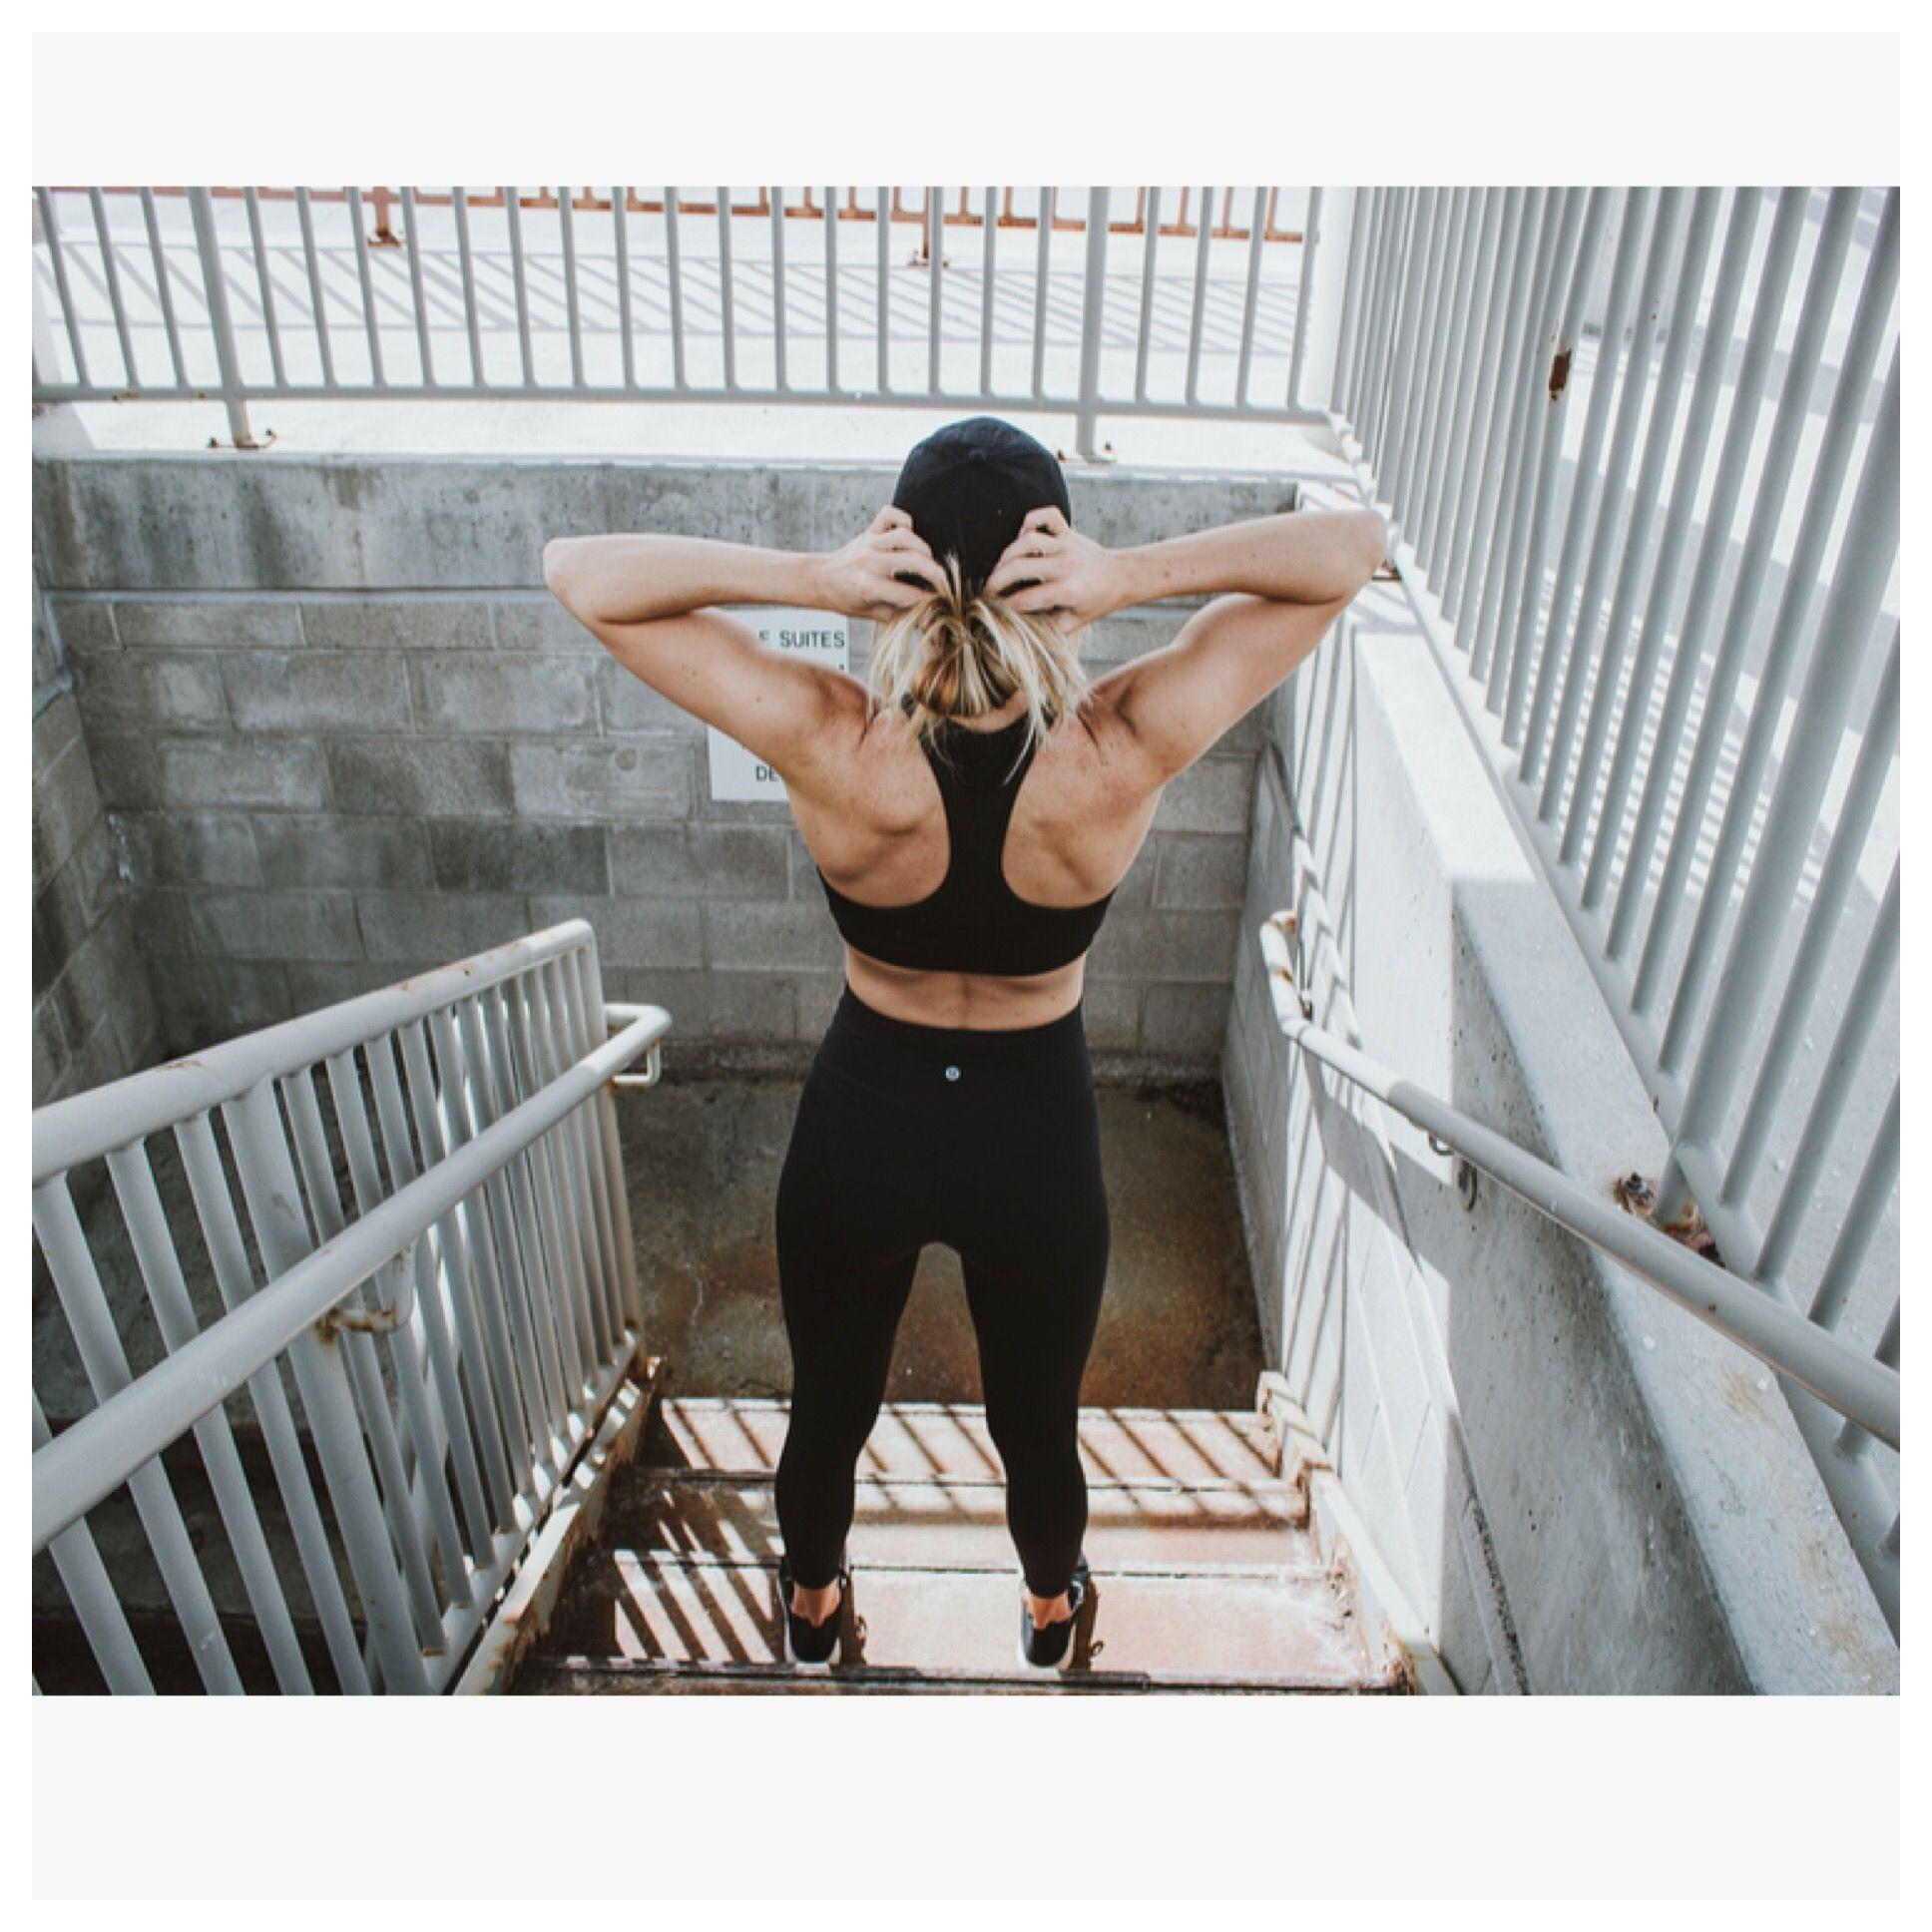 Fitness Inspiration #fitness #healthy #nike #tone IG: @jadeshia_fitness